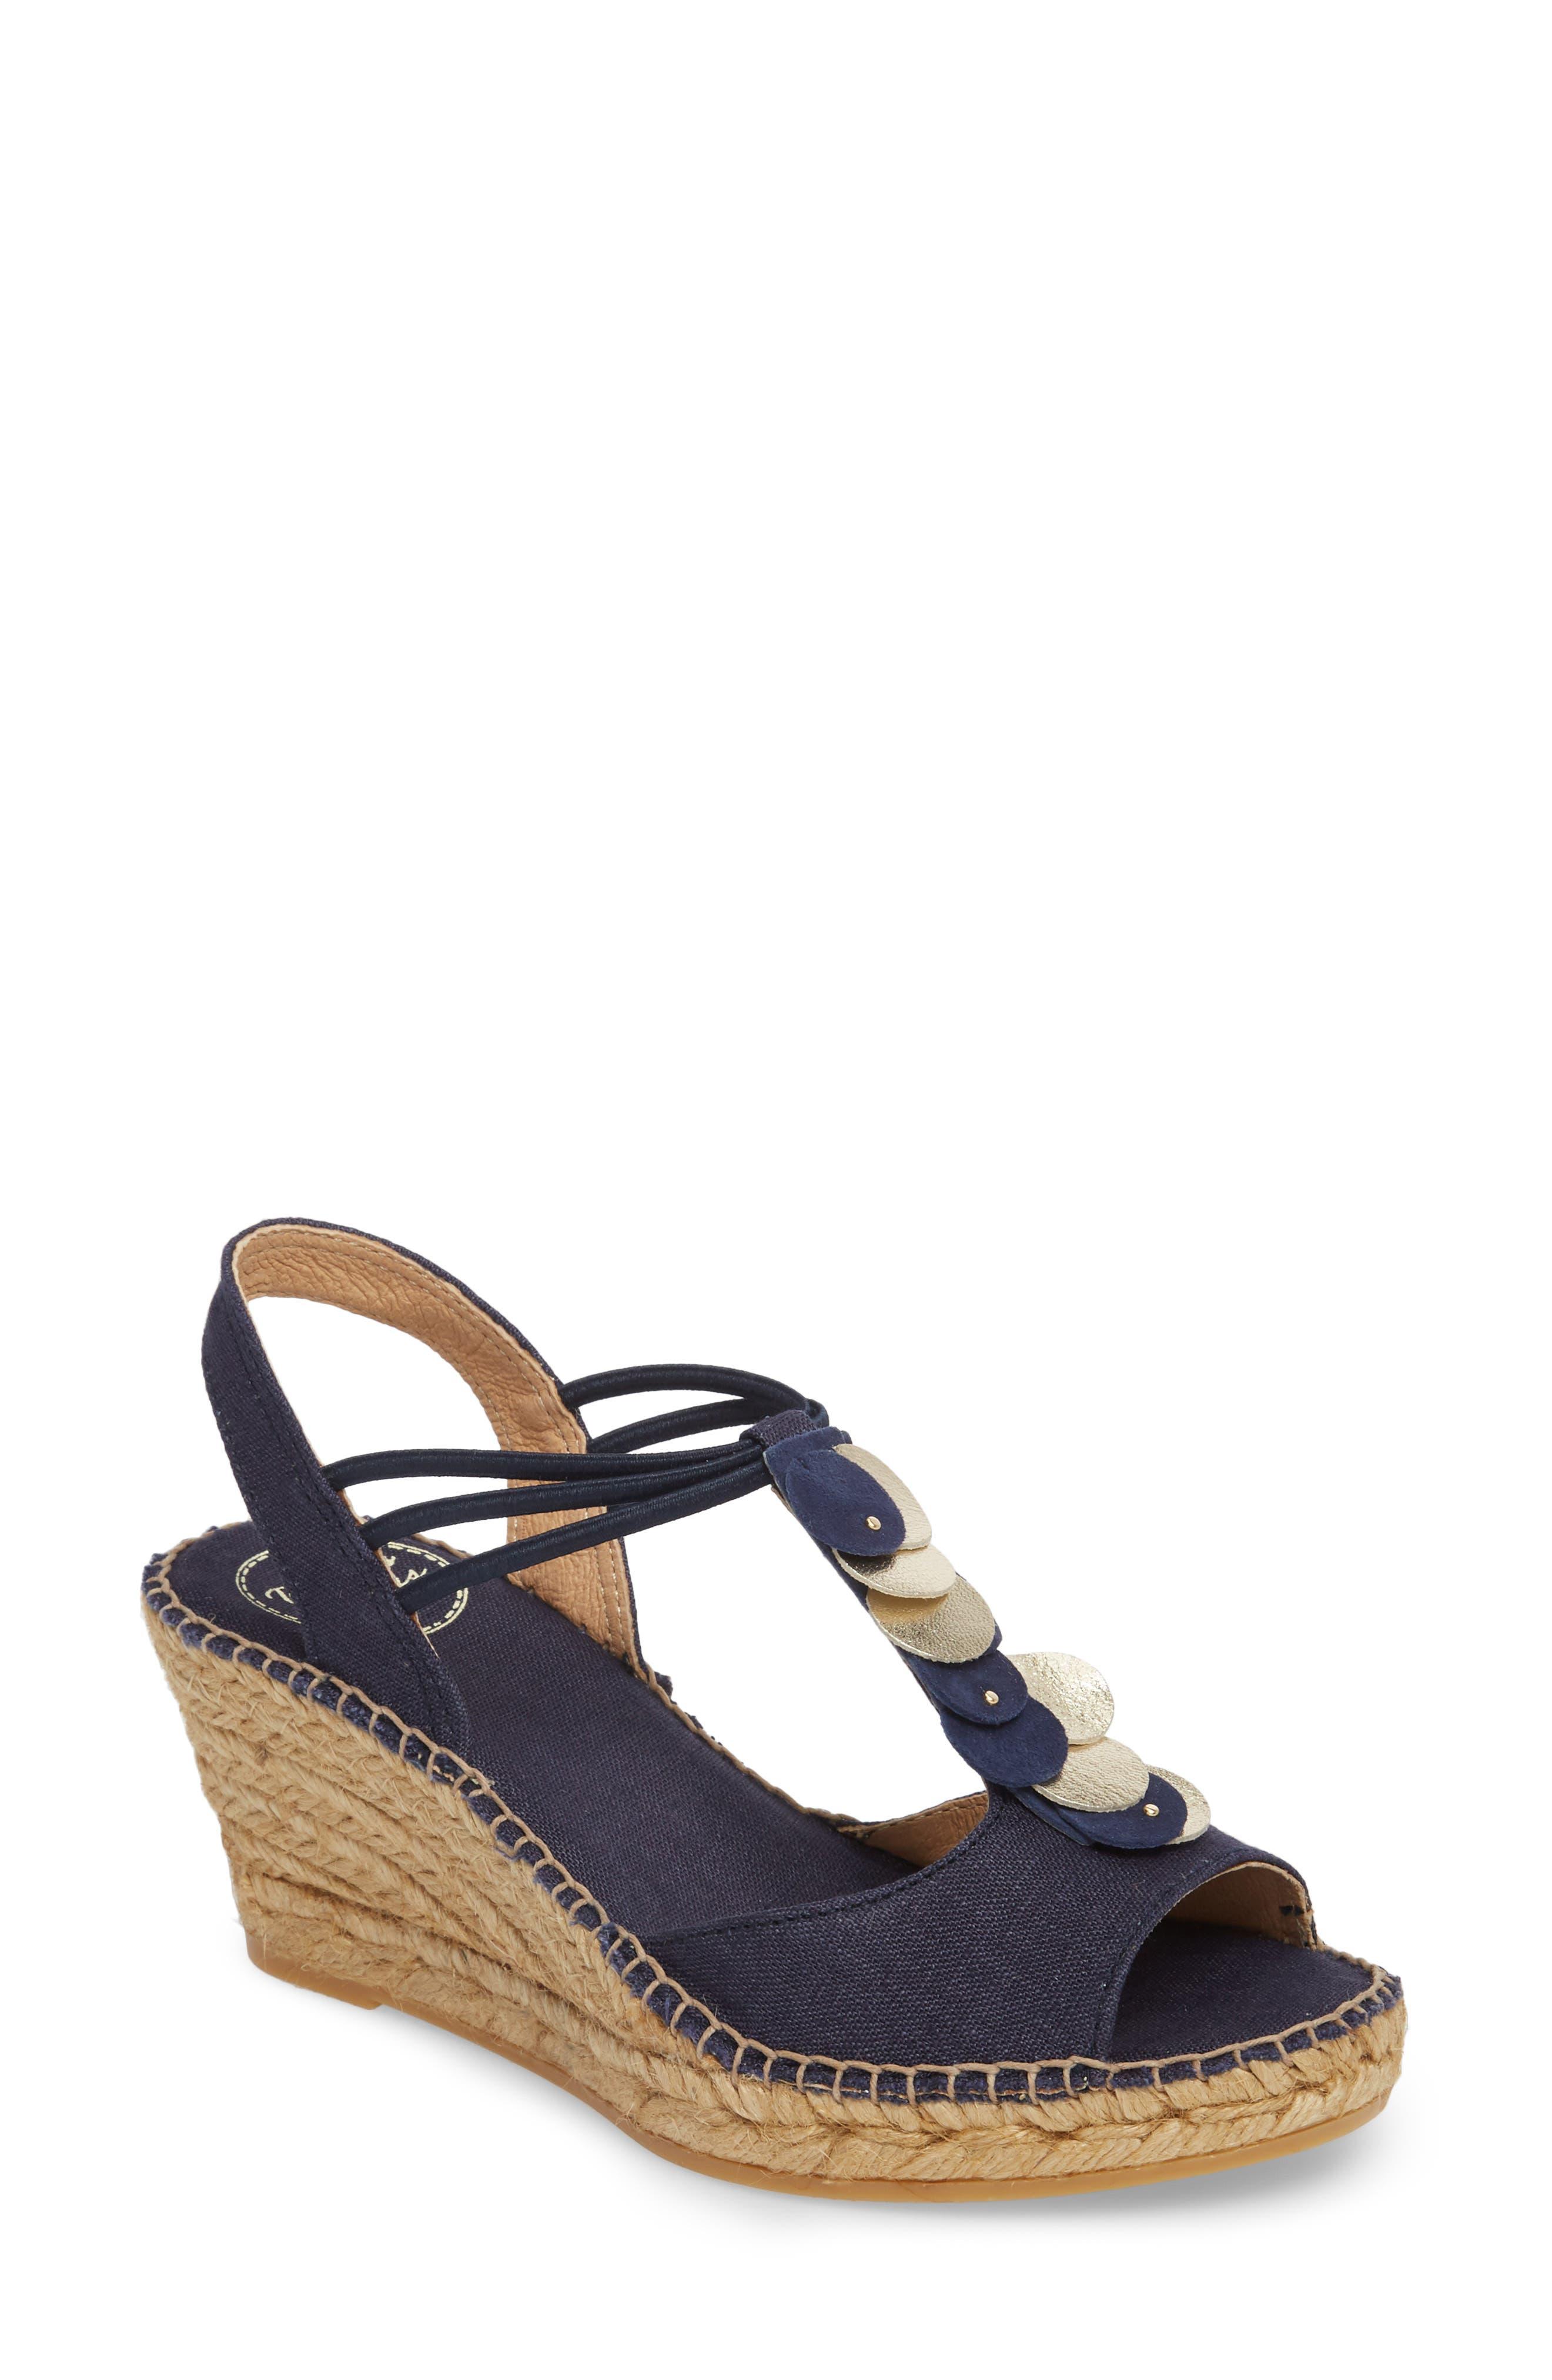 Sitges Espadrille Sandal,                         Main,                         color, NAVY FABRIC